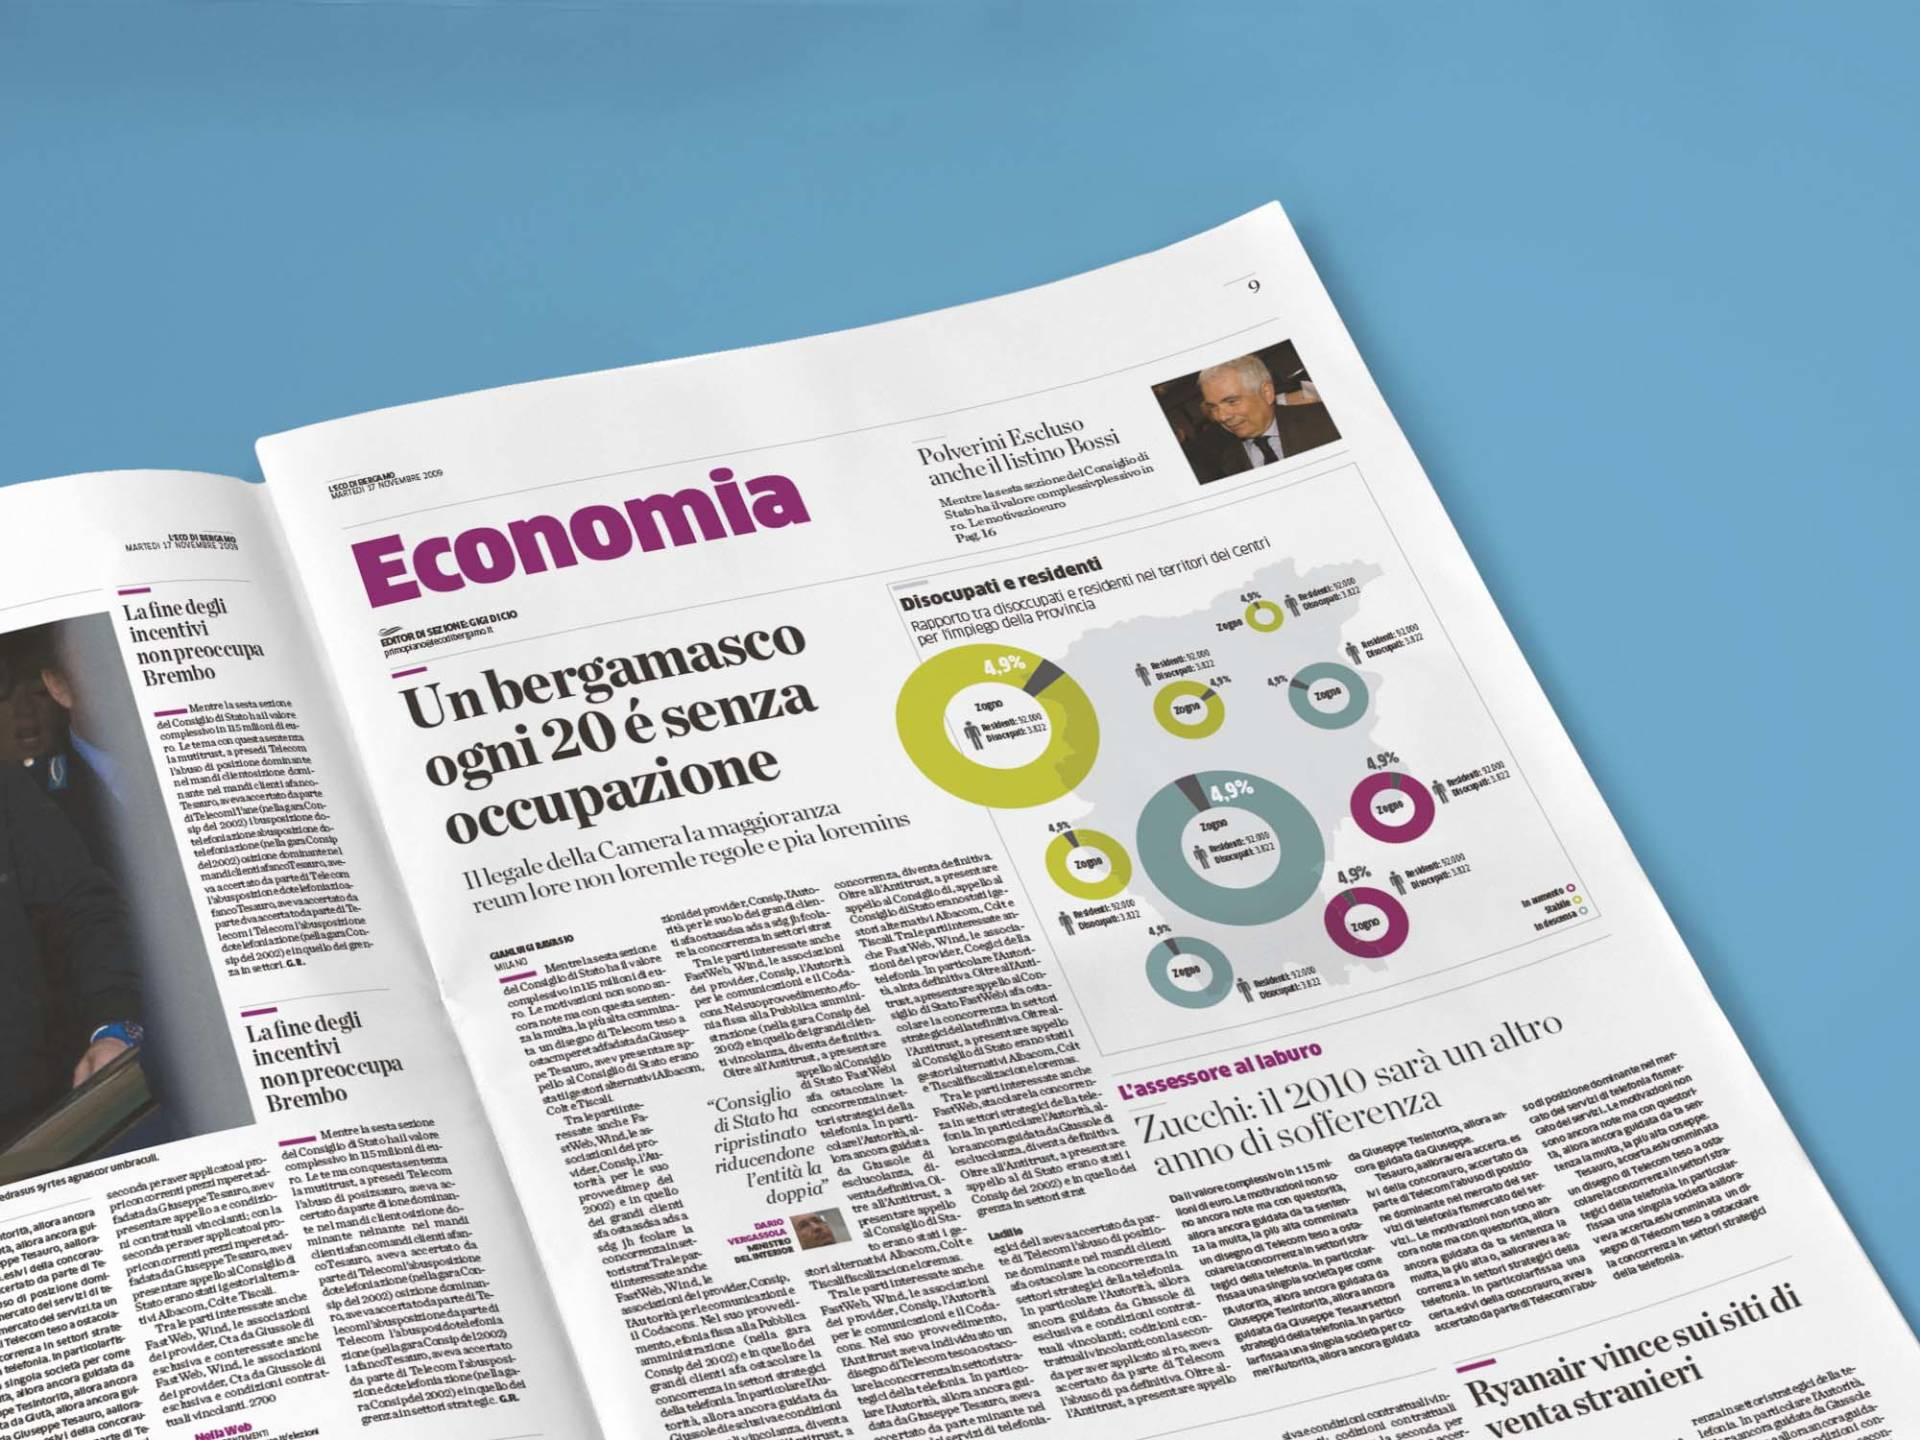 L'Eco_Di_Bergamo_Info_01_Wenceslau_News_Design